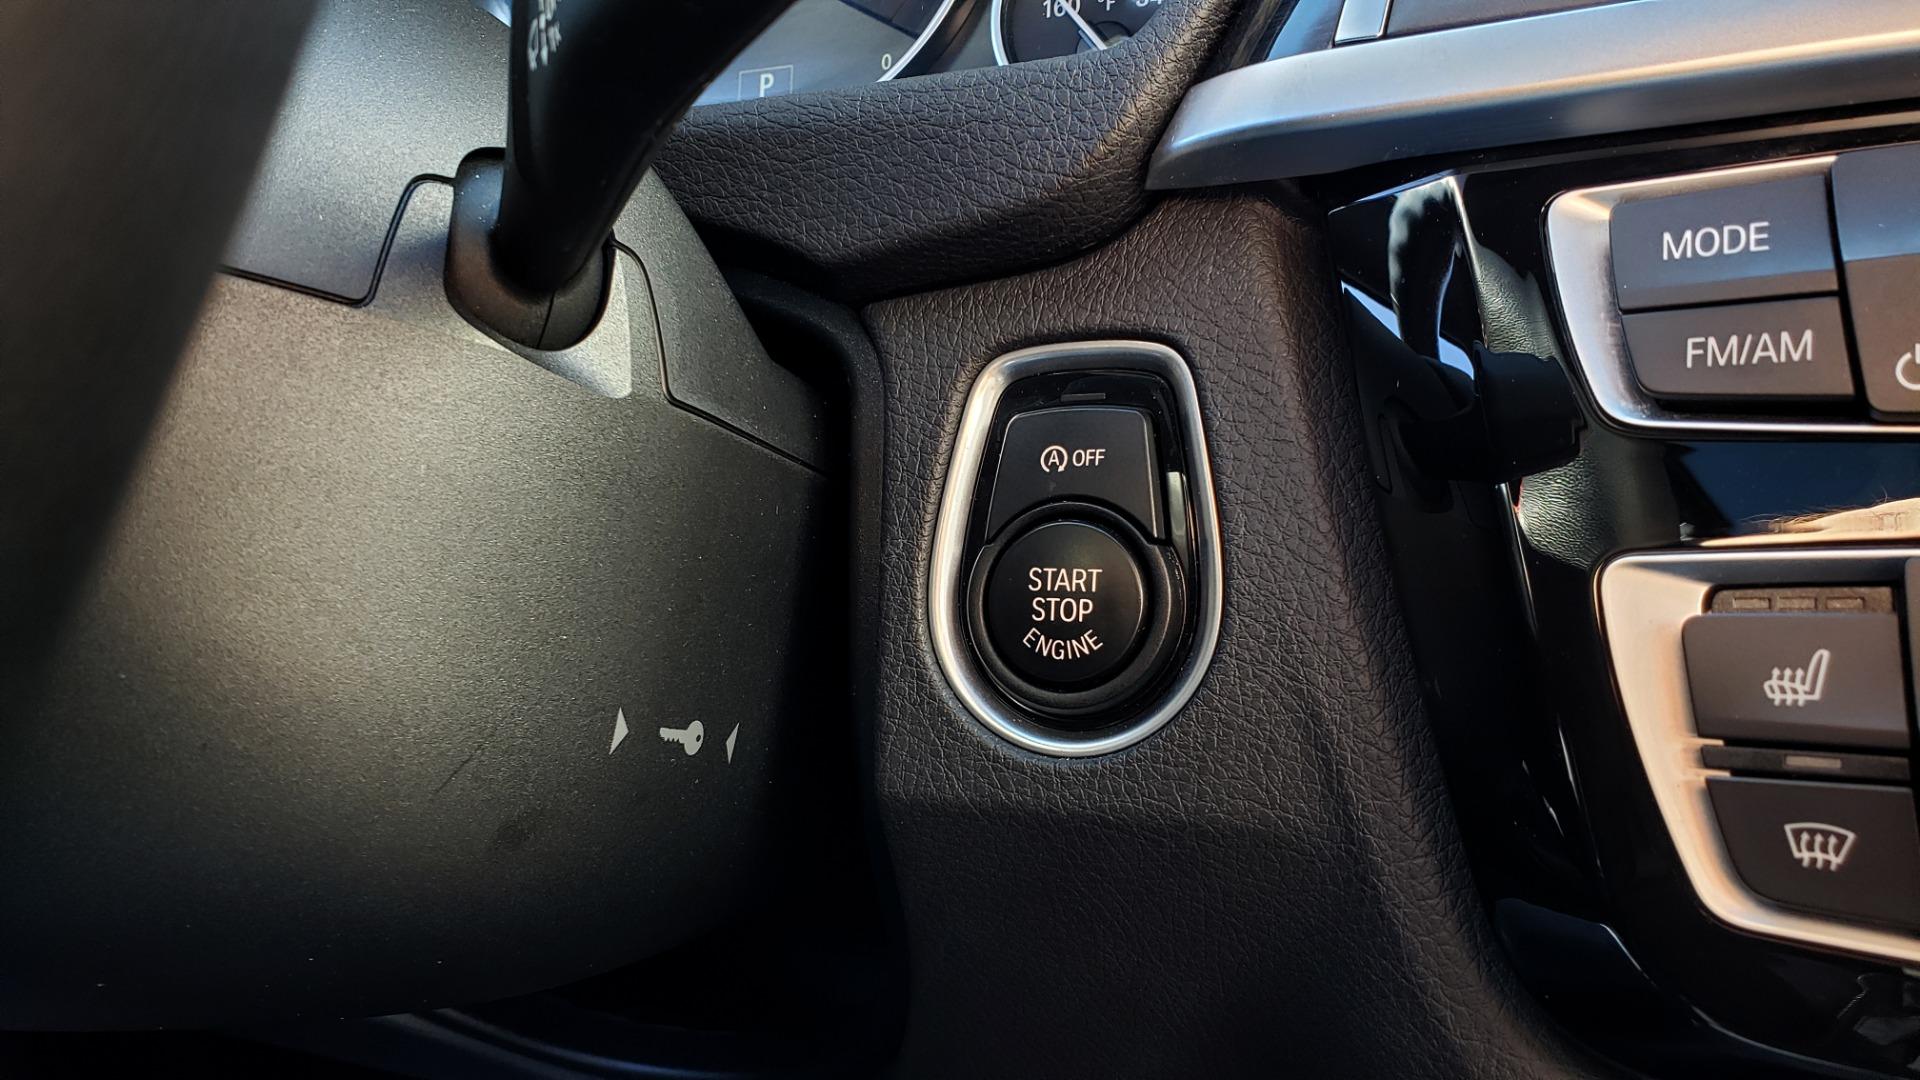 Used 2018 BMW 4 SERIES 430IXDRIVE / PREMIUM / NAV / SUNROOF / ESSENTIALS PKG for sale $29,495 at Formula Imports in Charlotte NC 28227 40